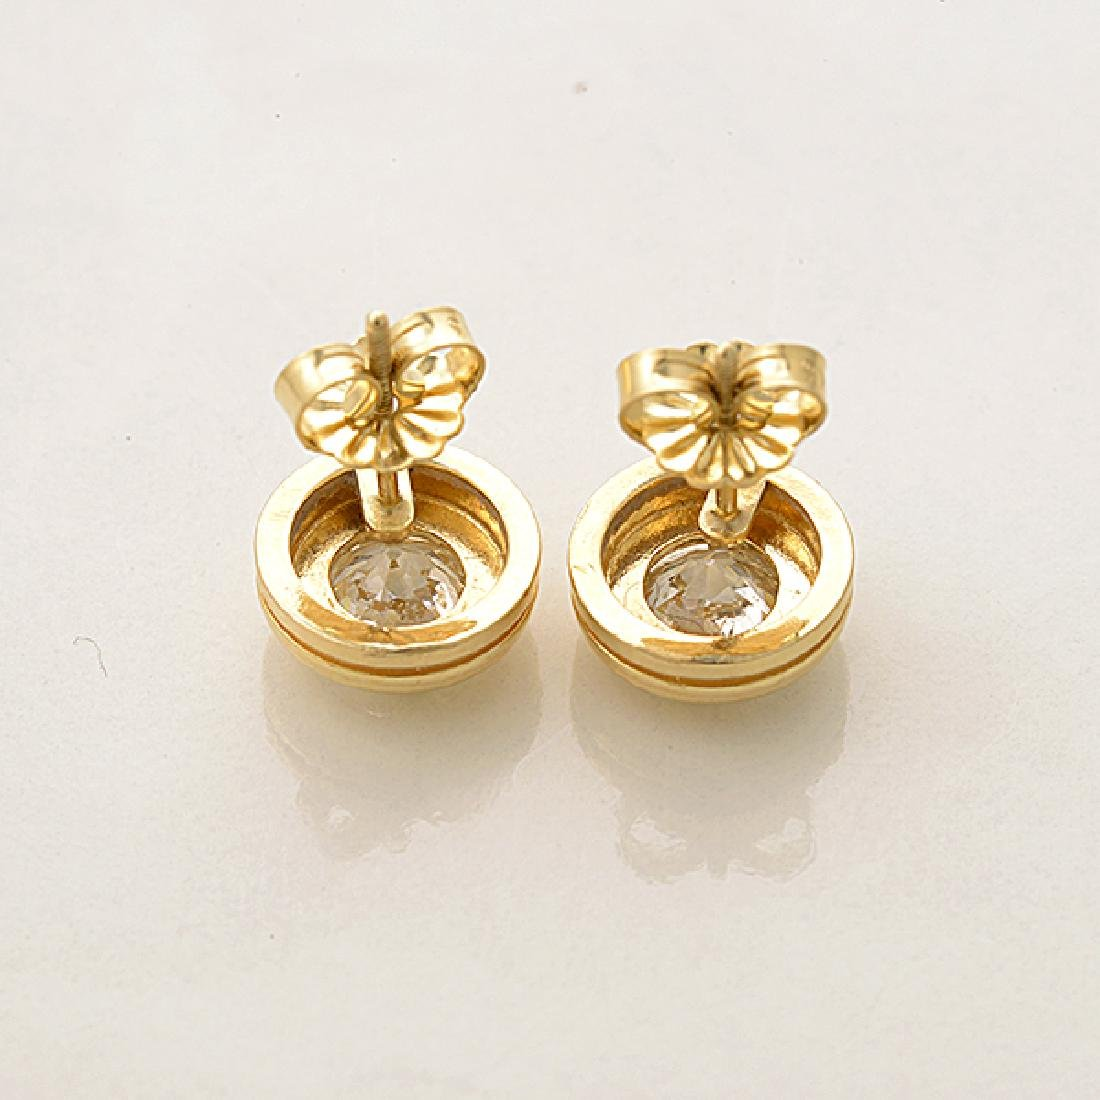 Pair of Diamond, 14k Yellow Gold Stud Earrings. - 4